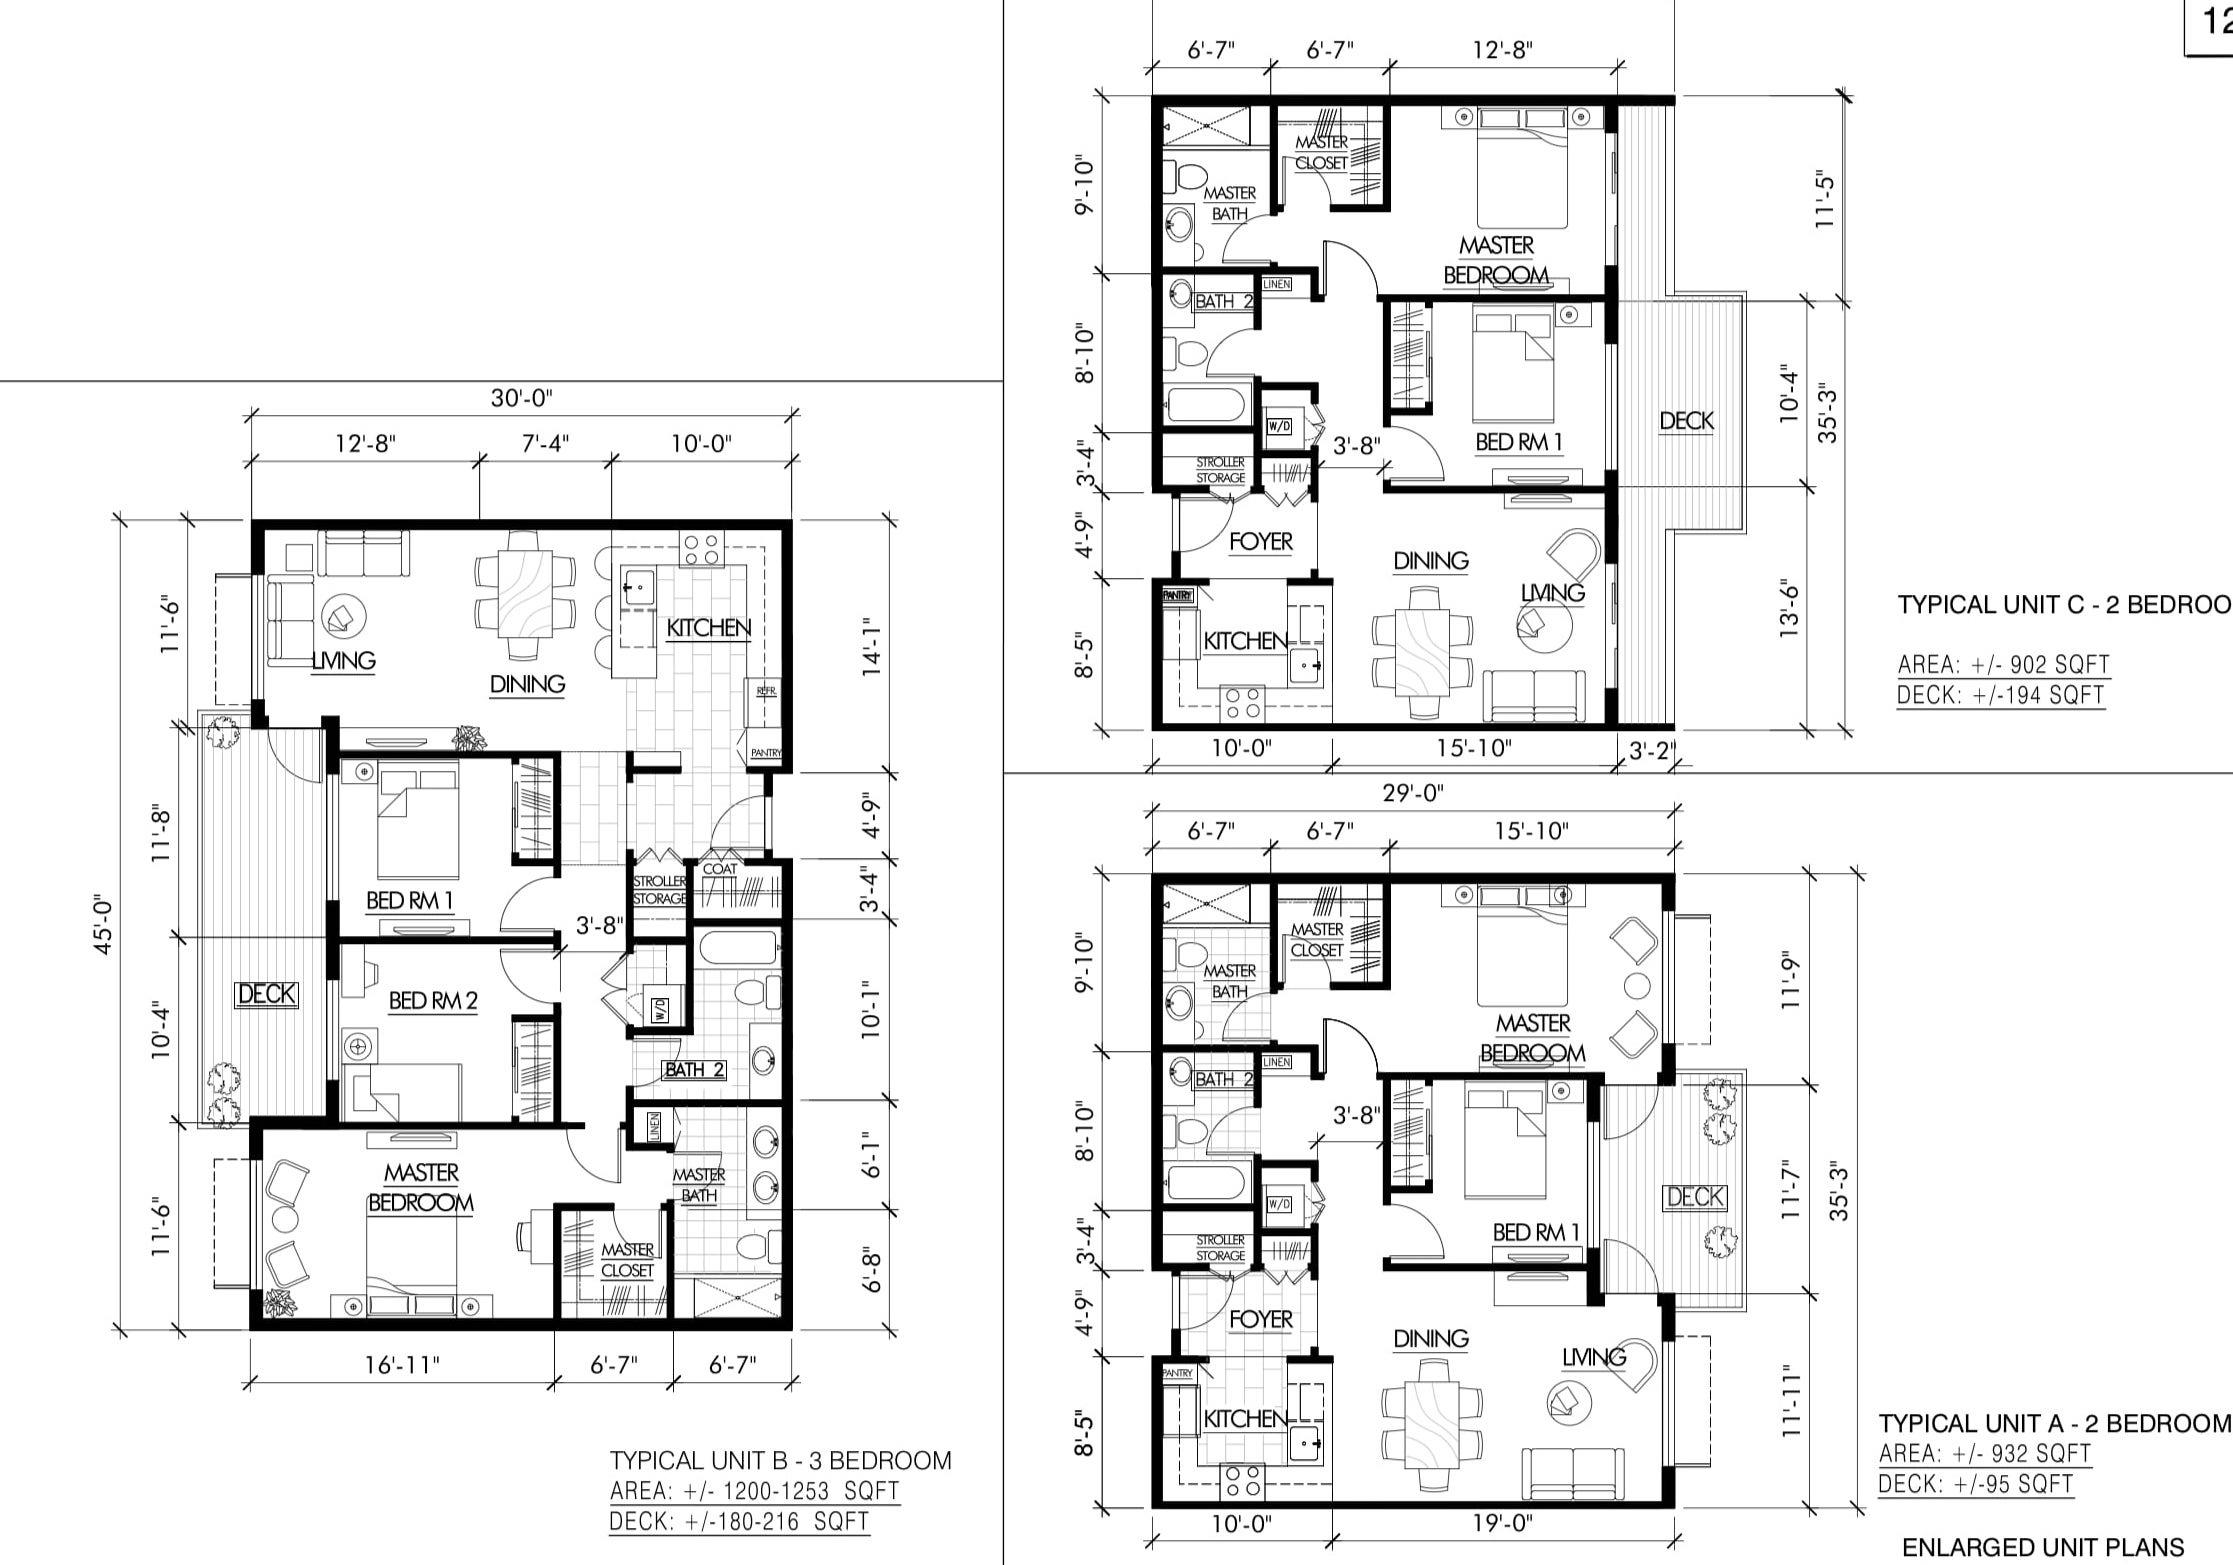 1225 65th Street Unit Plans